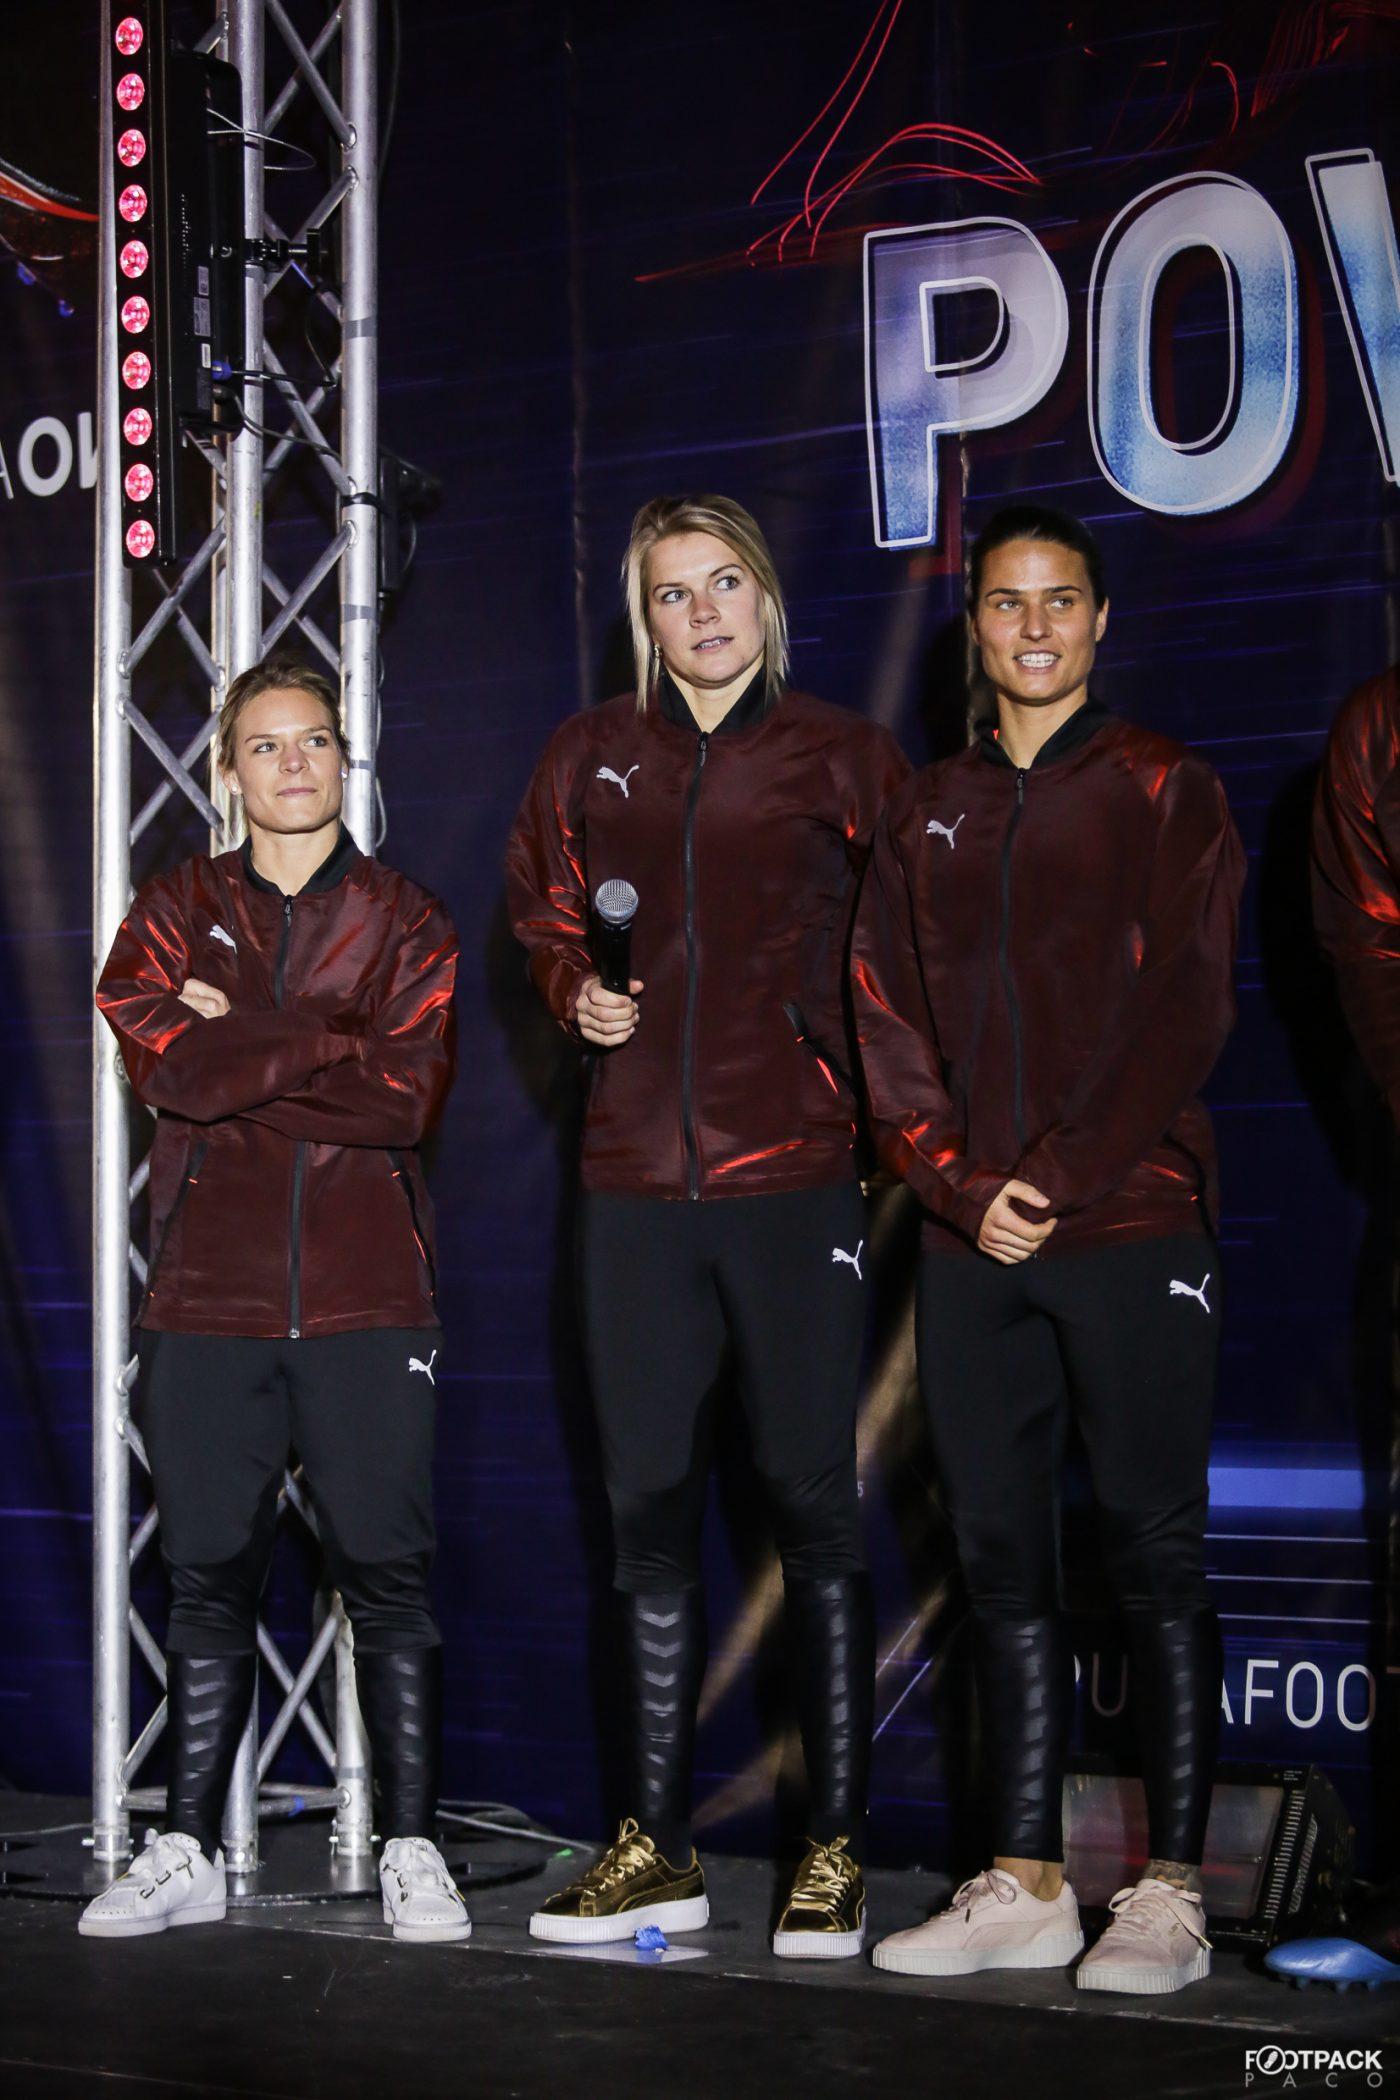 puma-power-up-night-marseille-footpack-février-2019-6